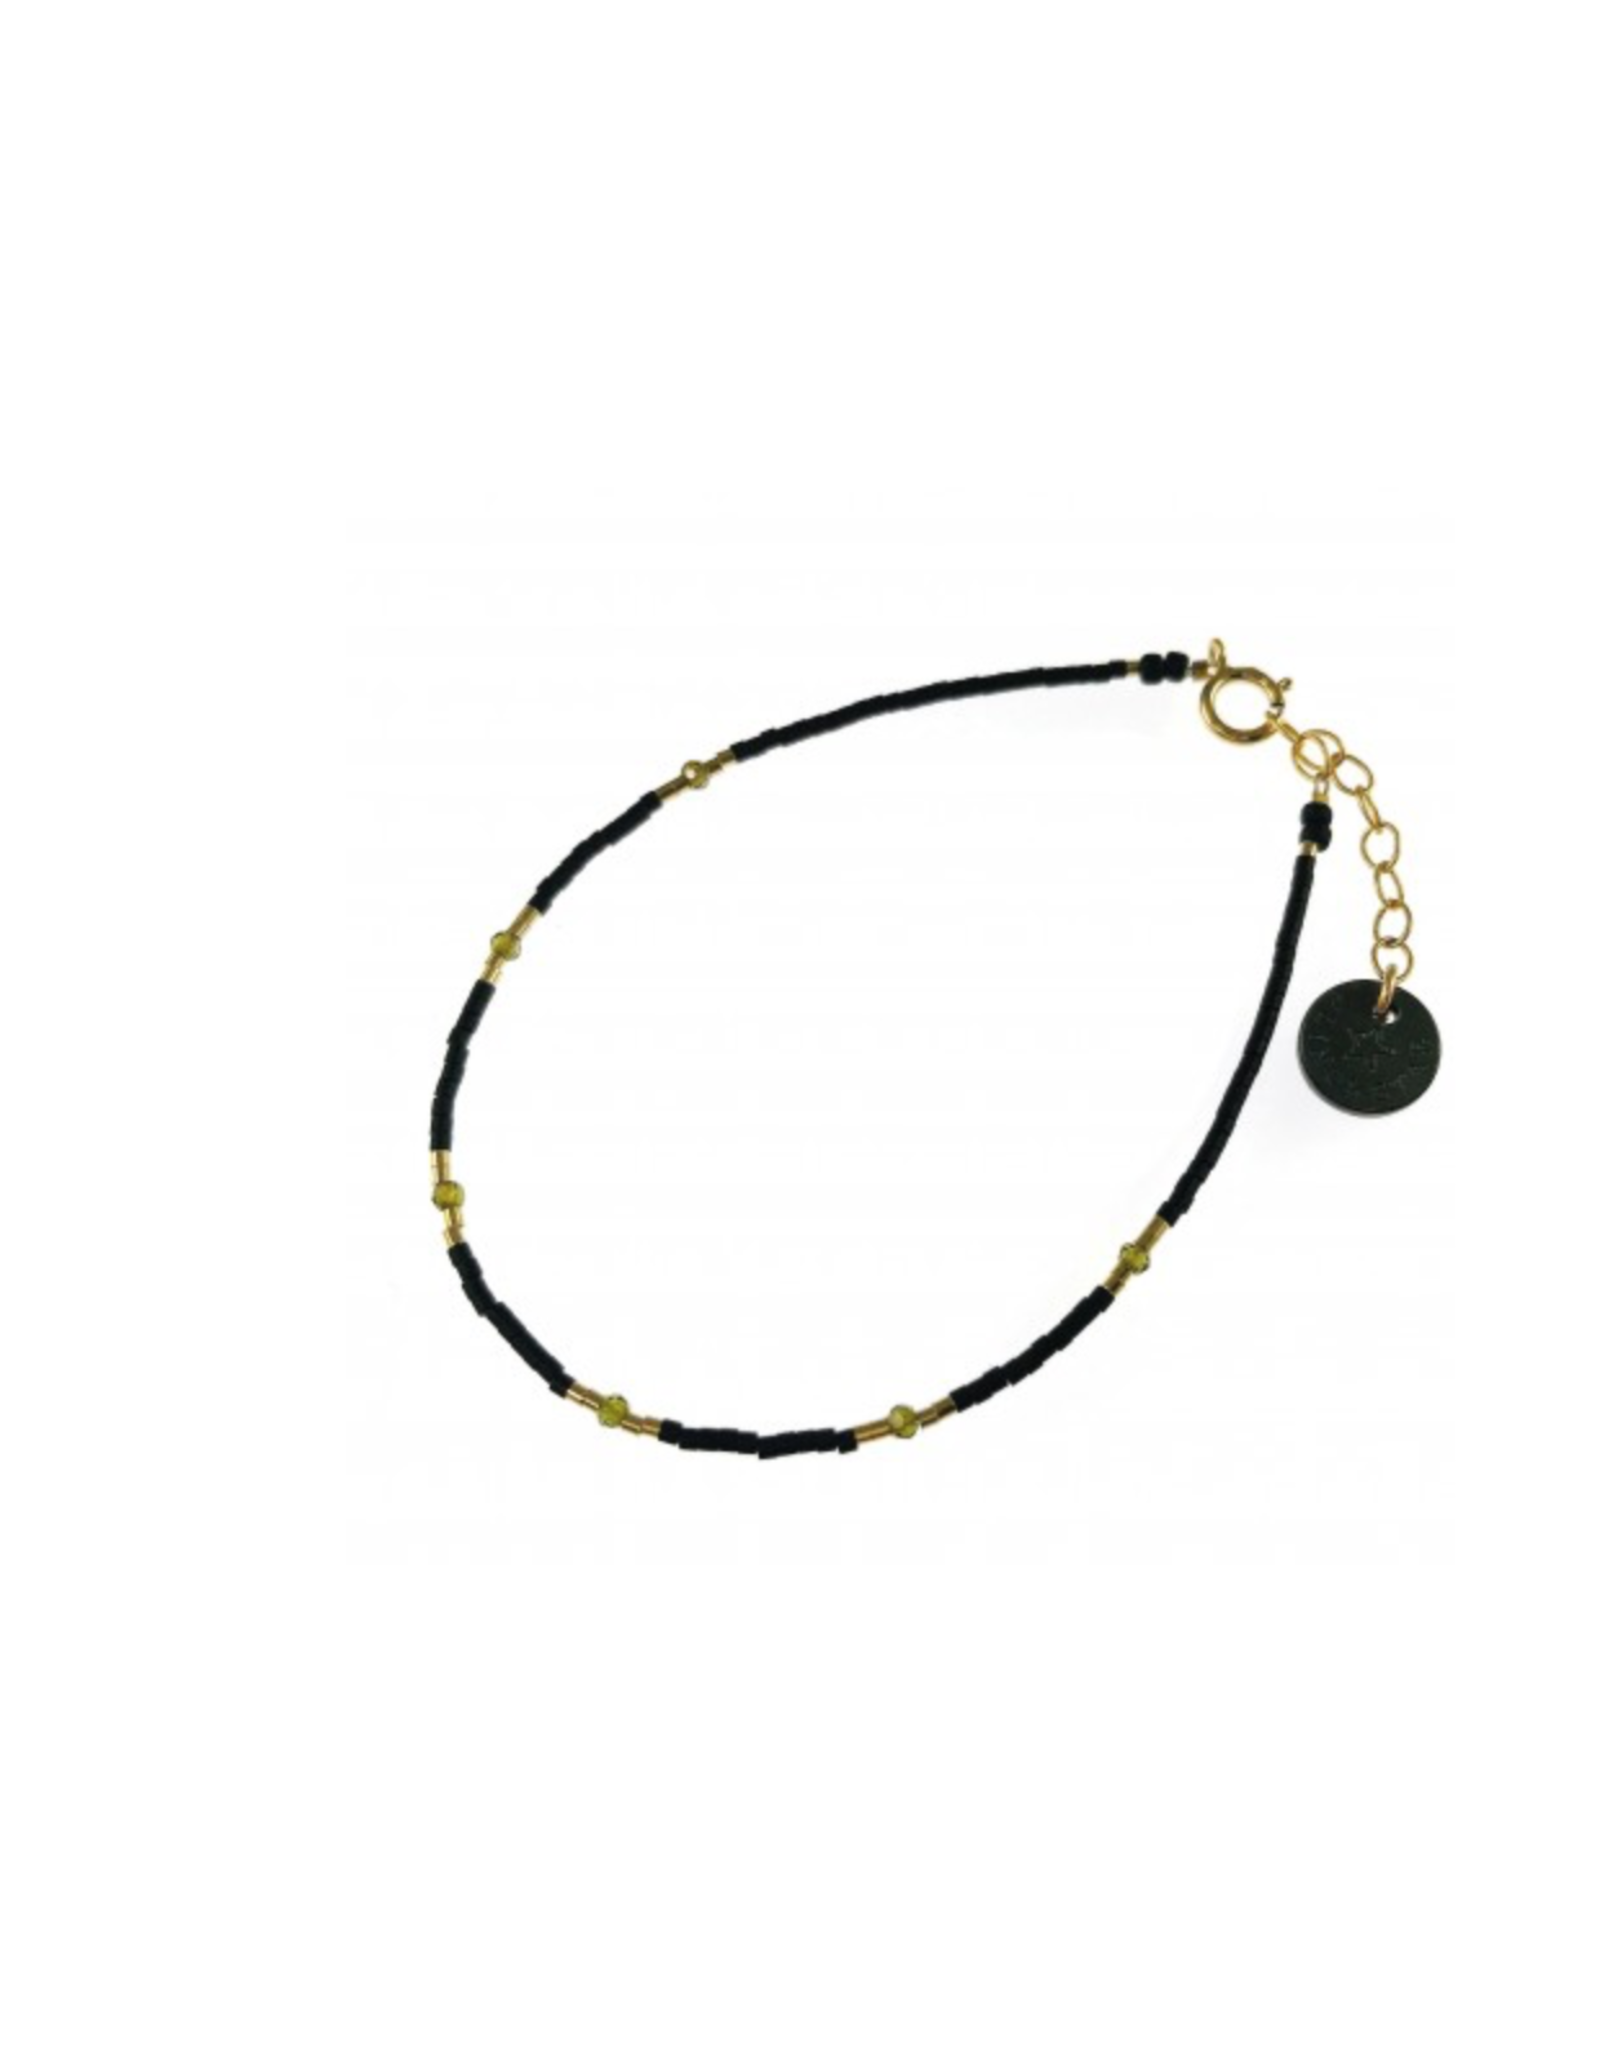 blinckstar armband 1902A34